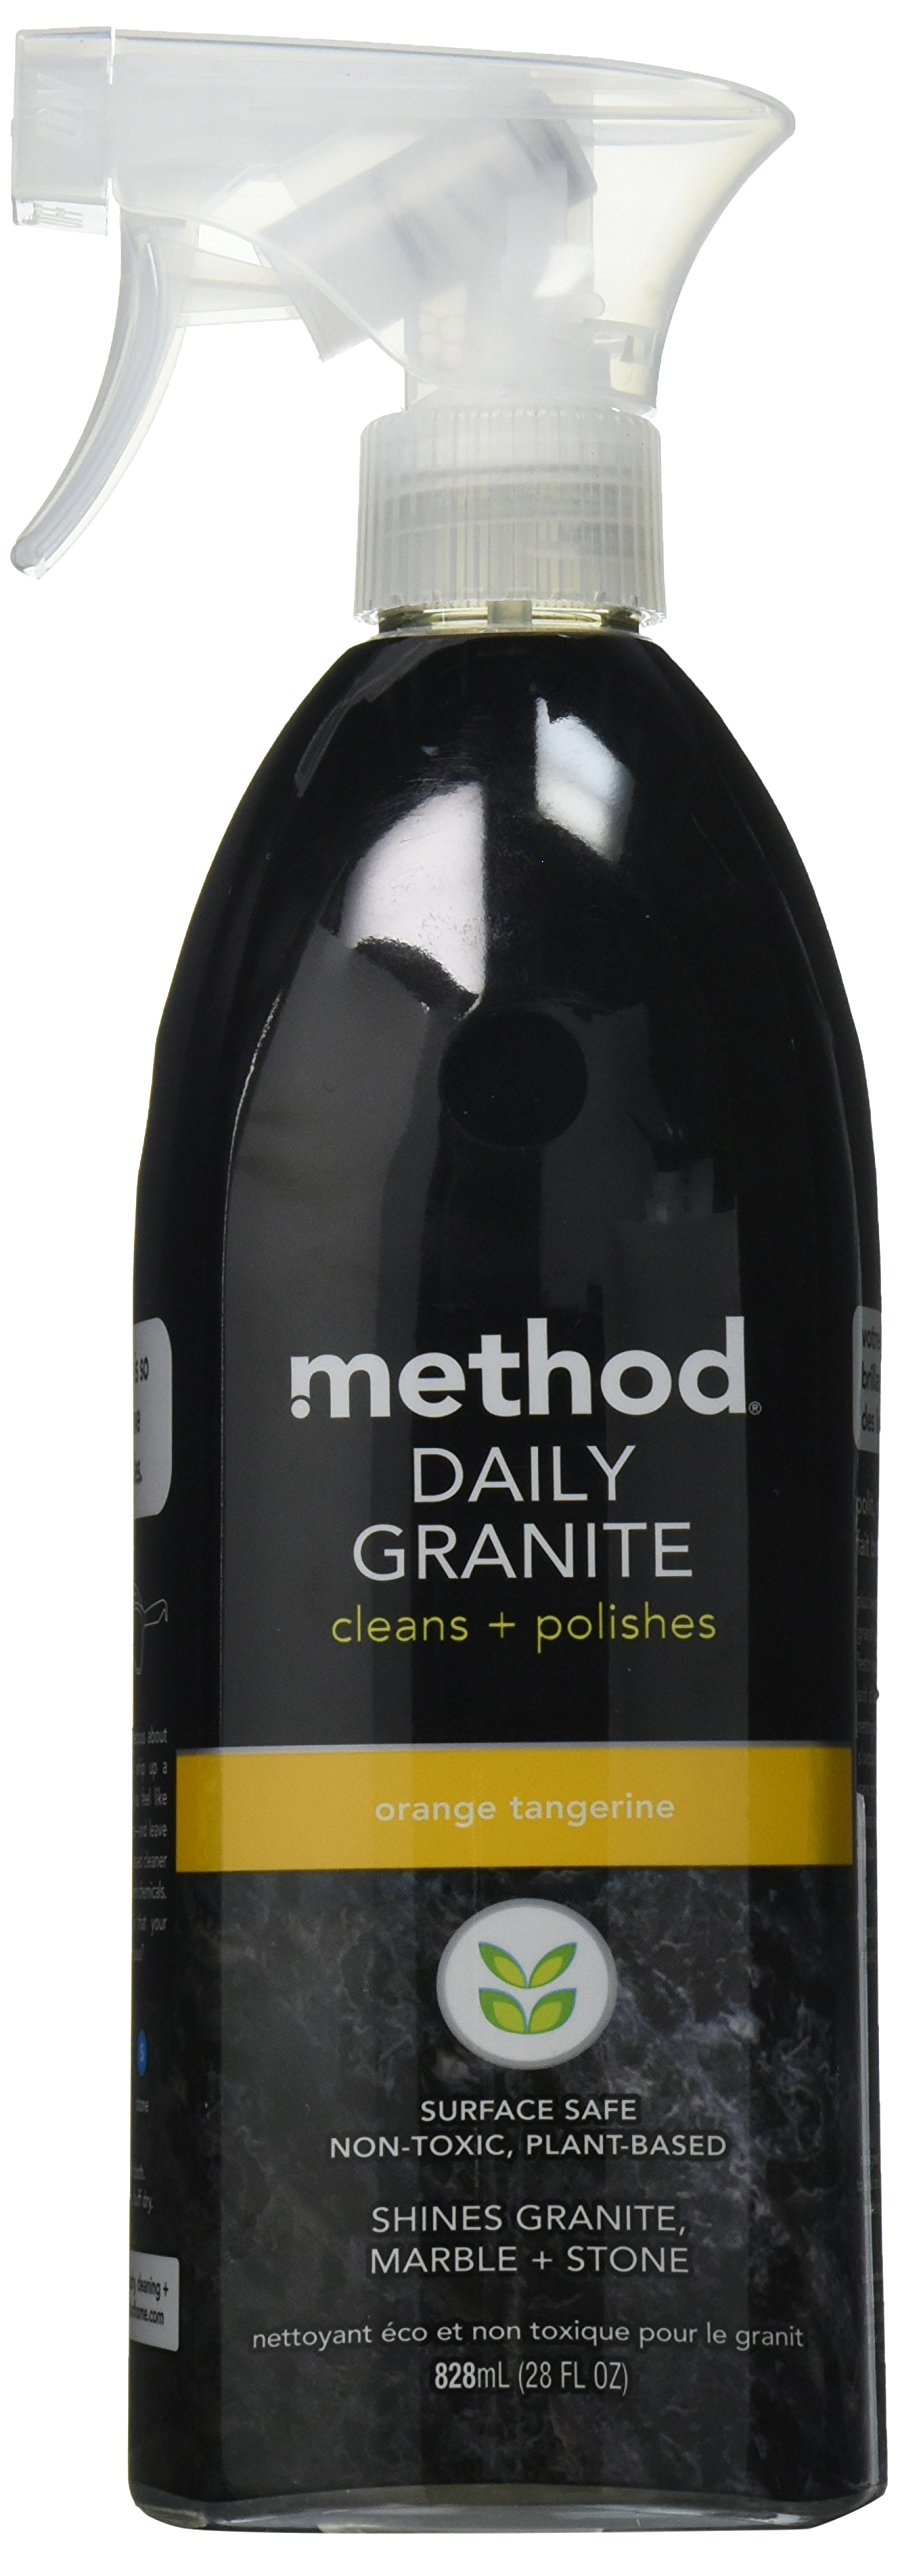 Method 482-S-F9 Daily Granite Cleaner, Orange Tangerine, 28 Ounce by Method